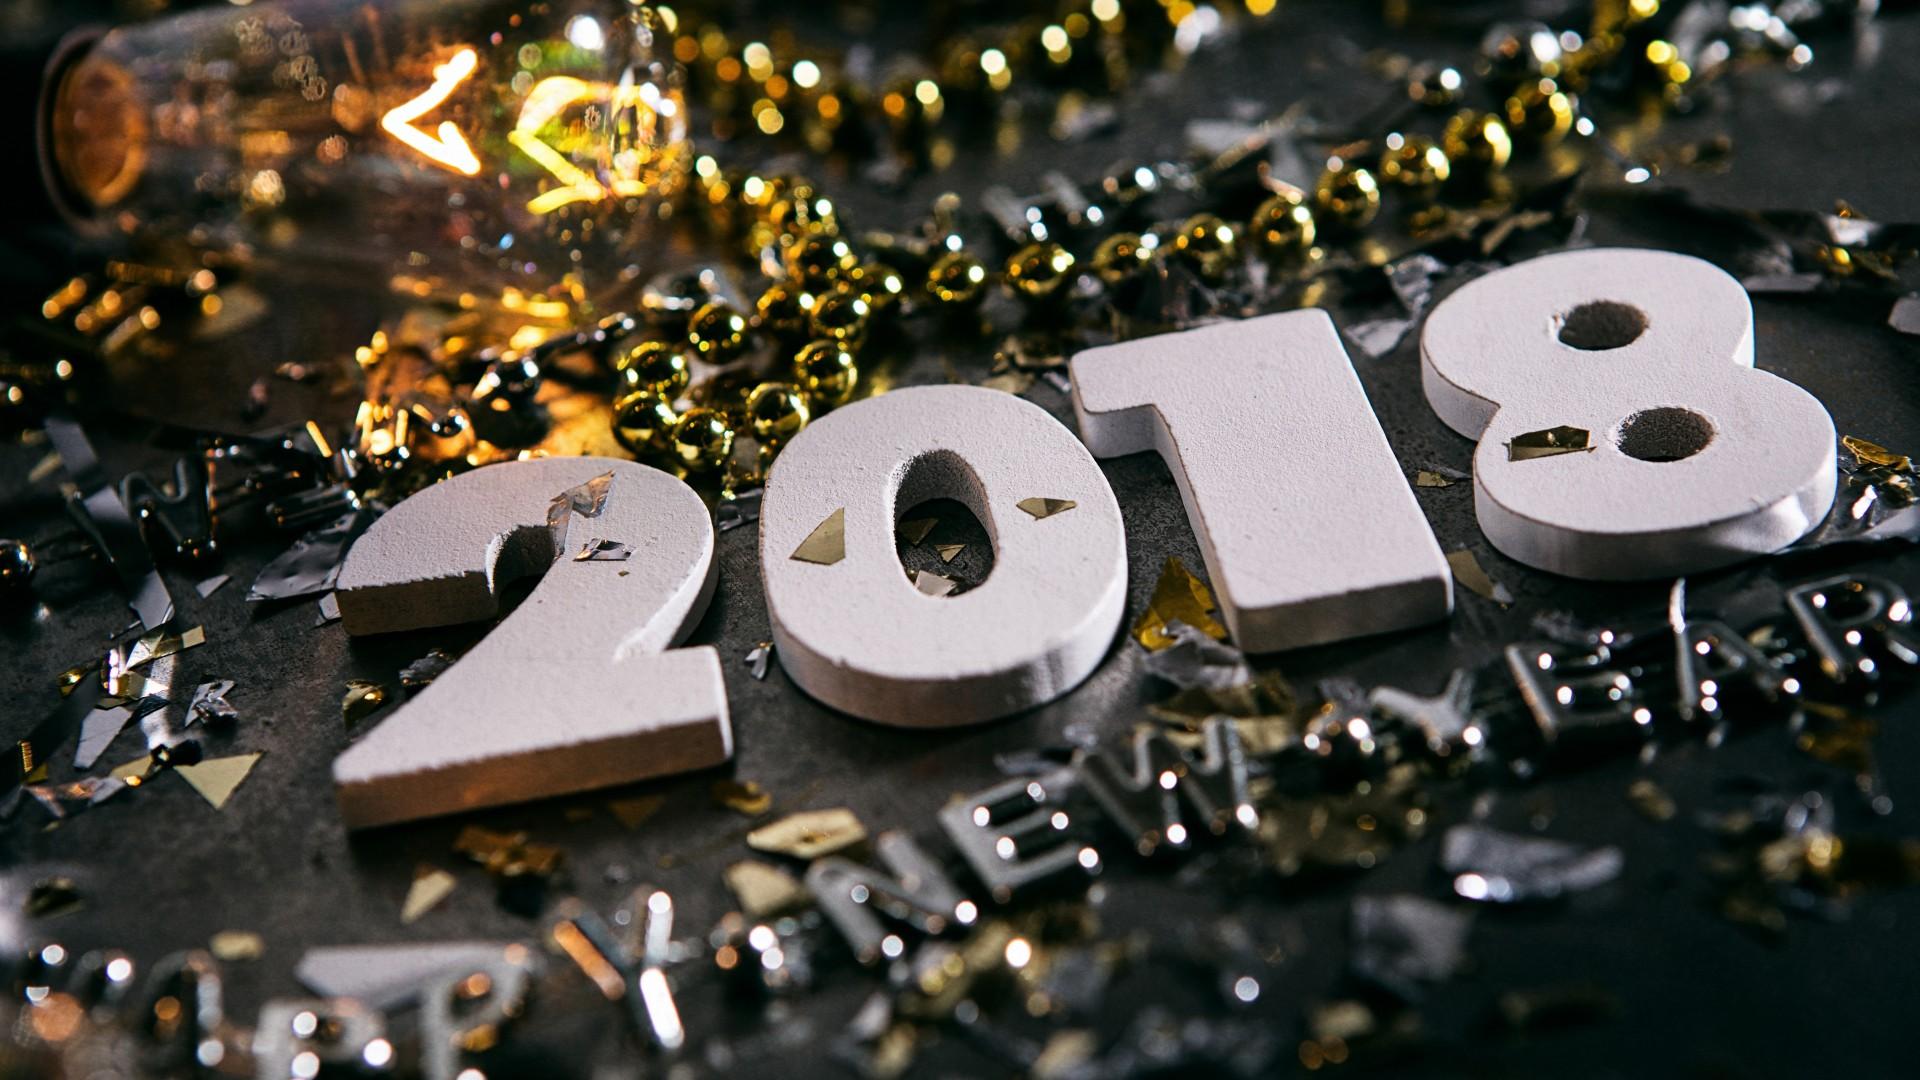 happy new year 2018 hd wallpaper wallpapersfanscom 1920x1080